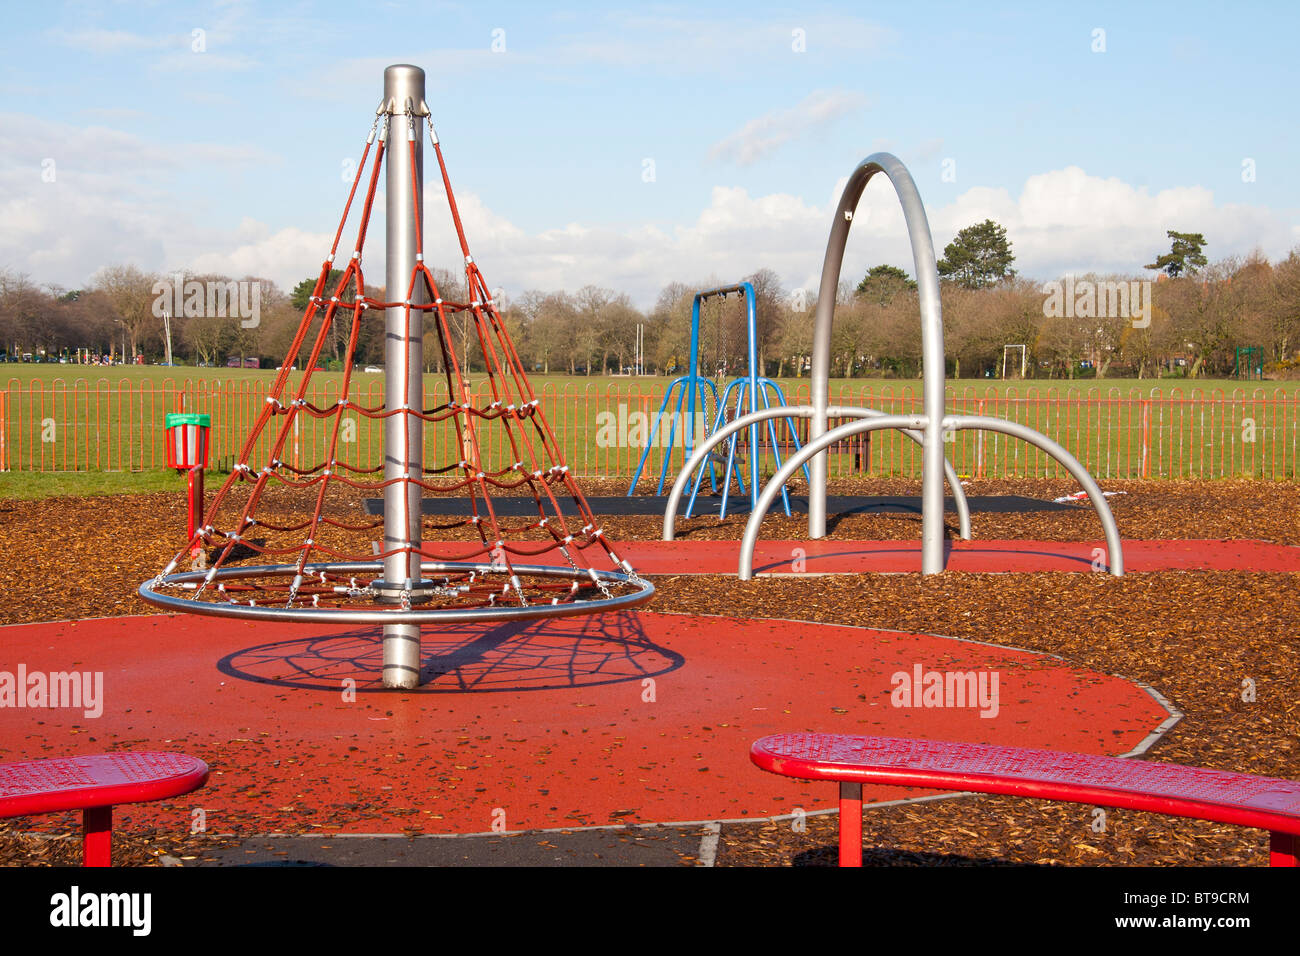 Roath Park Recreation ground children's play park, Cardiff, UK, GB - Stock Image